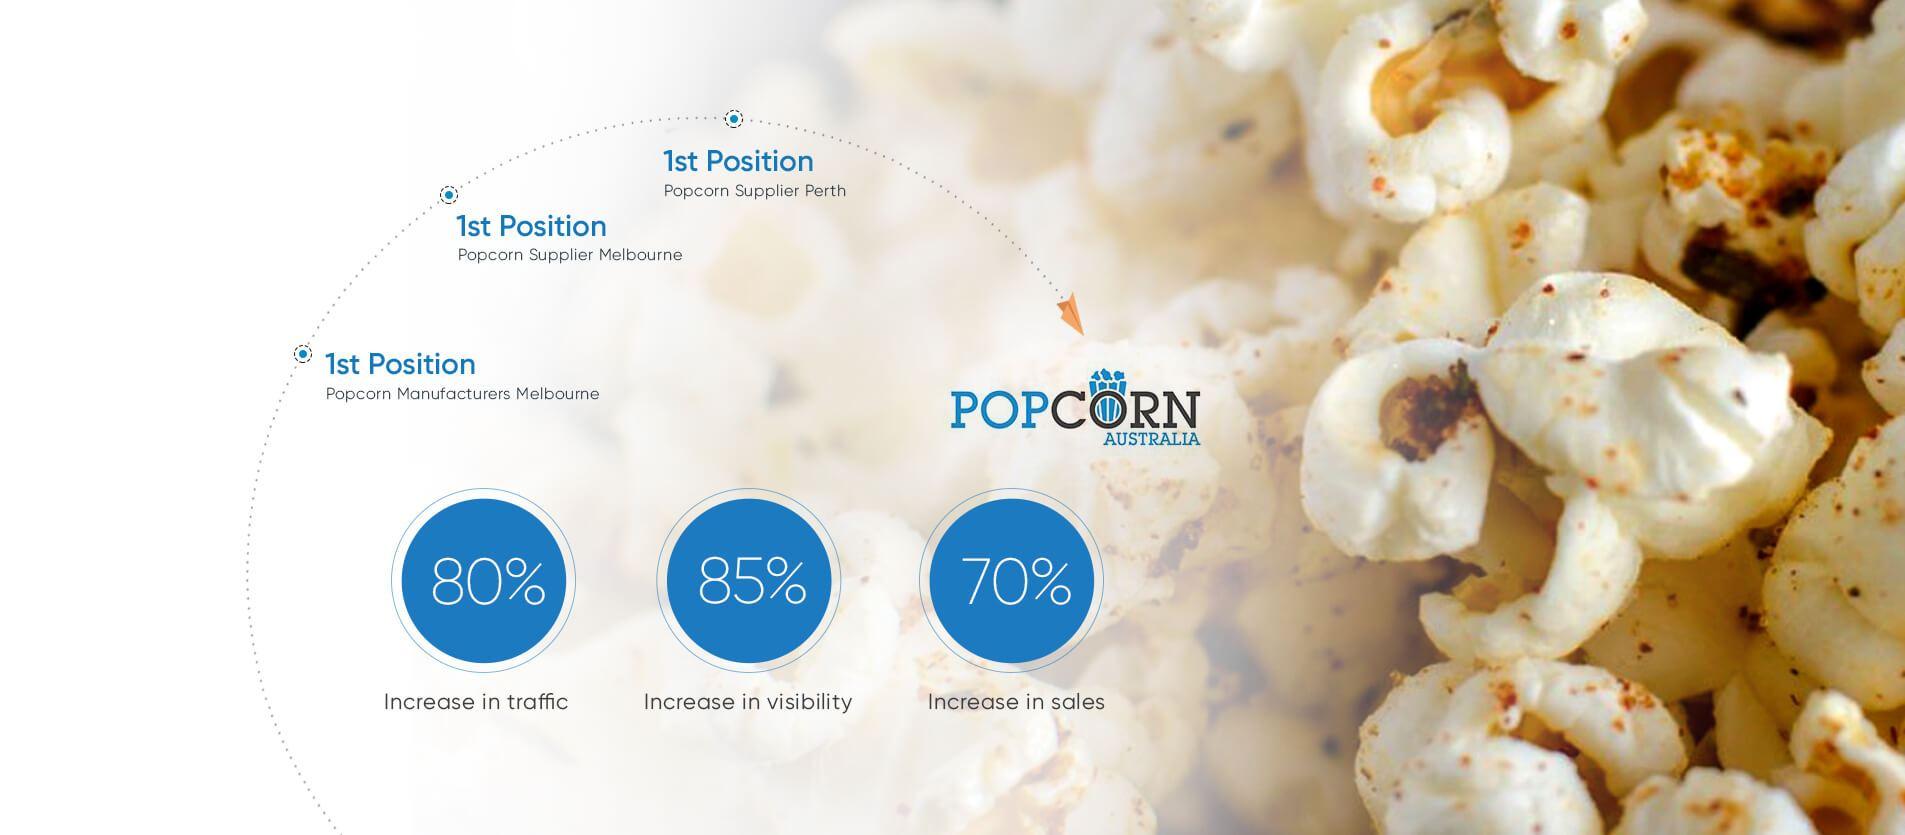 Popcorn Australia